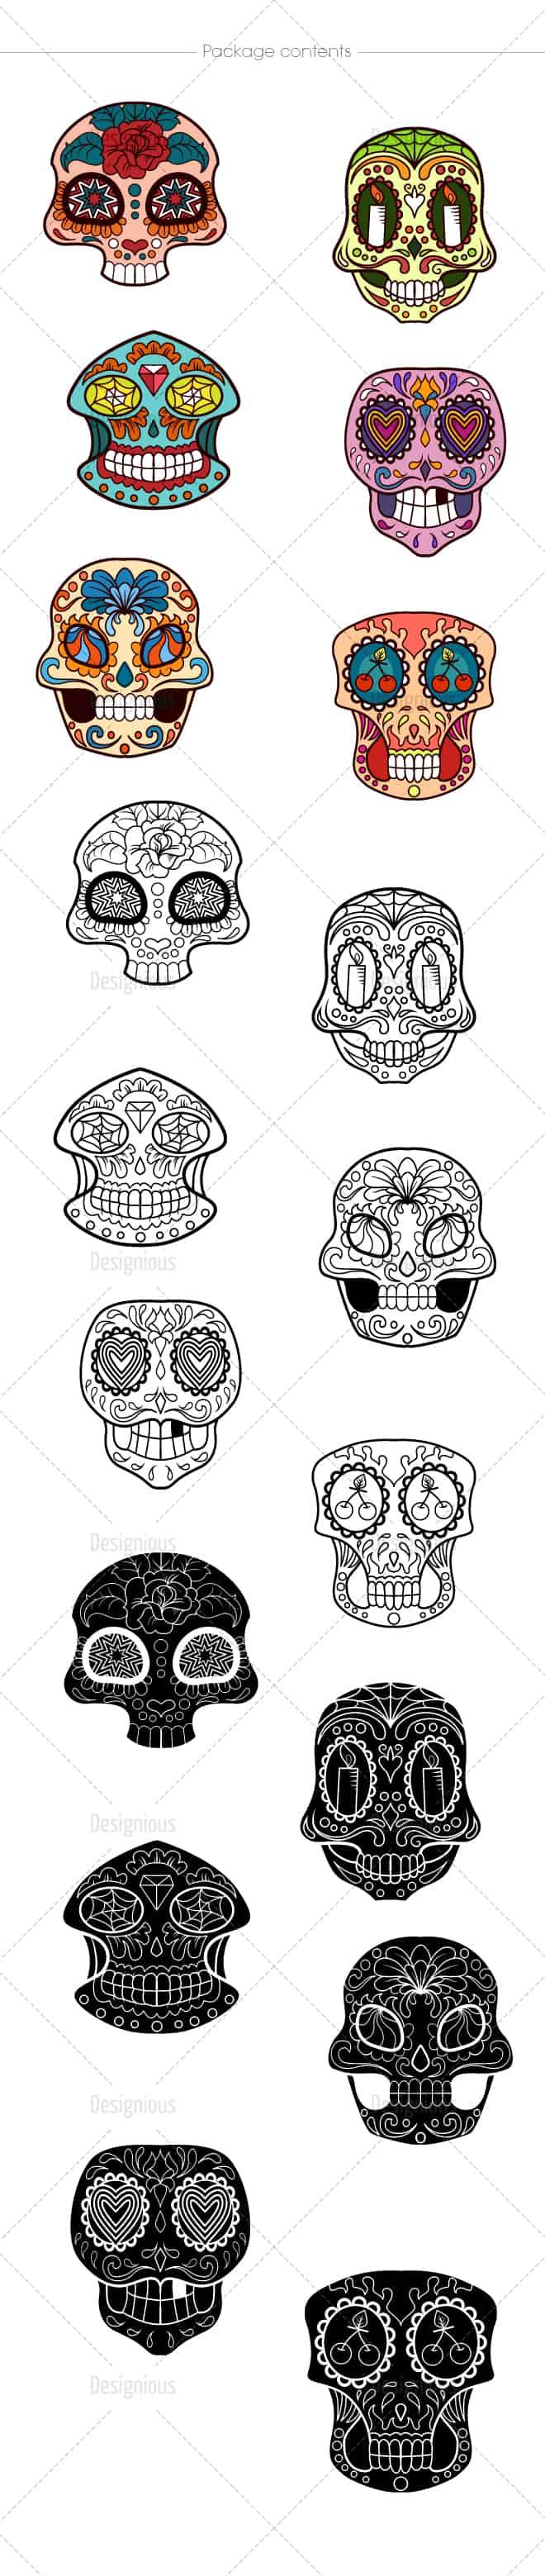 Sugar Skulls Vector Pack 40 designious vector sugar skulls 40 large